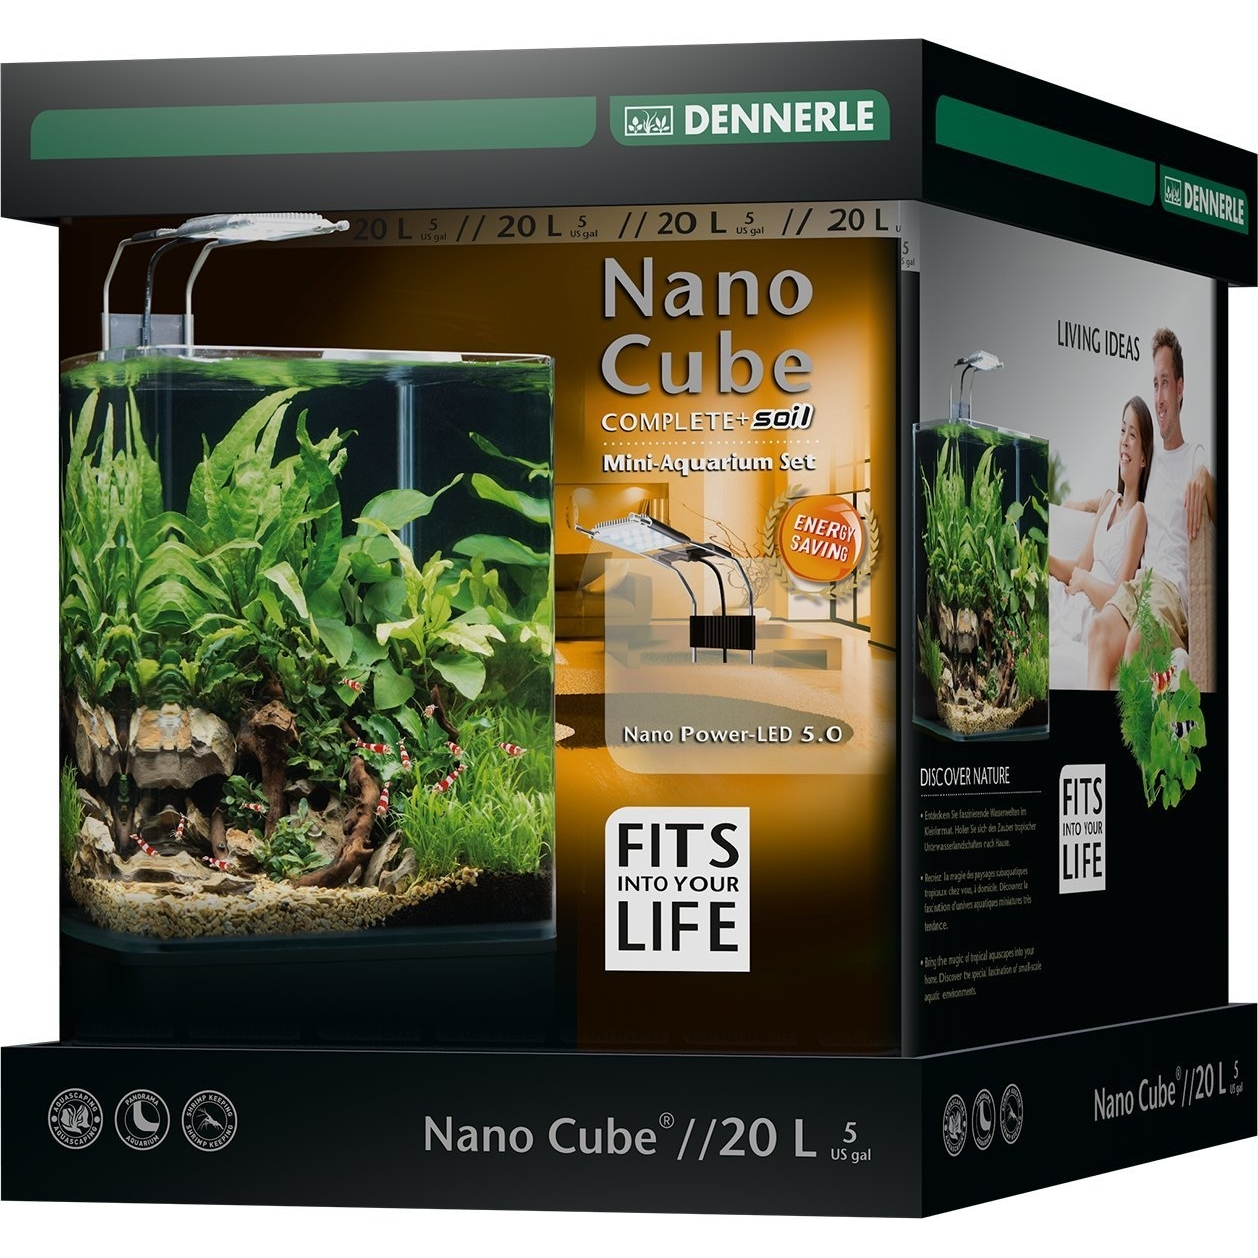 Dennerle NanoCube Complete+ SOIL PowerLED 5.0 Bild 3